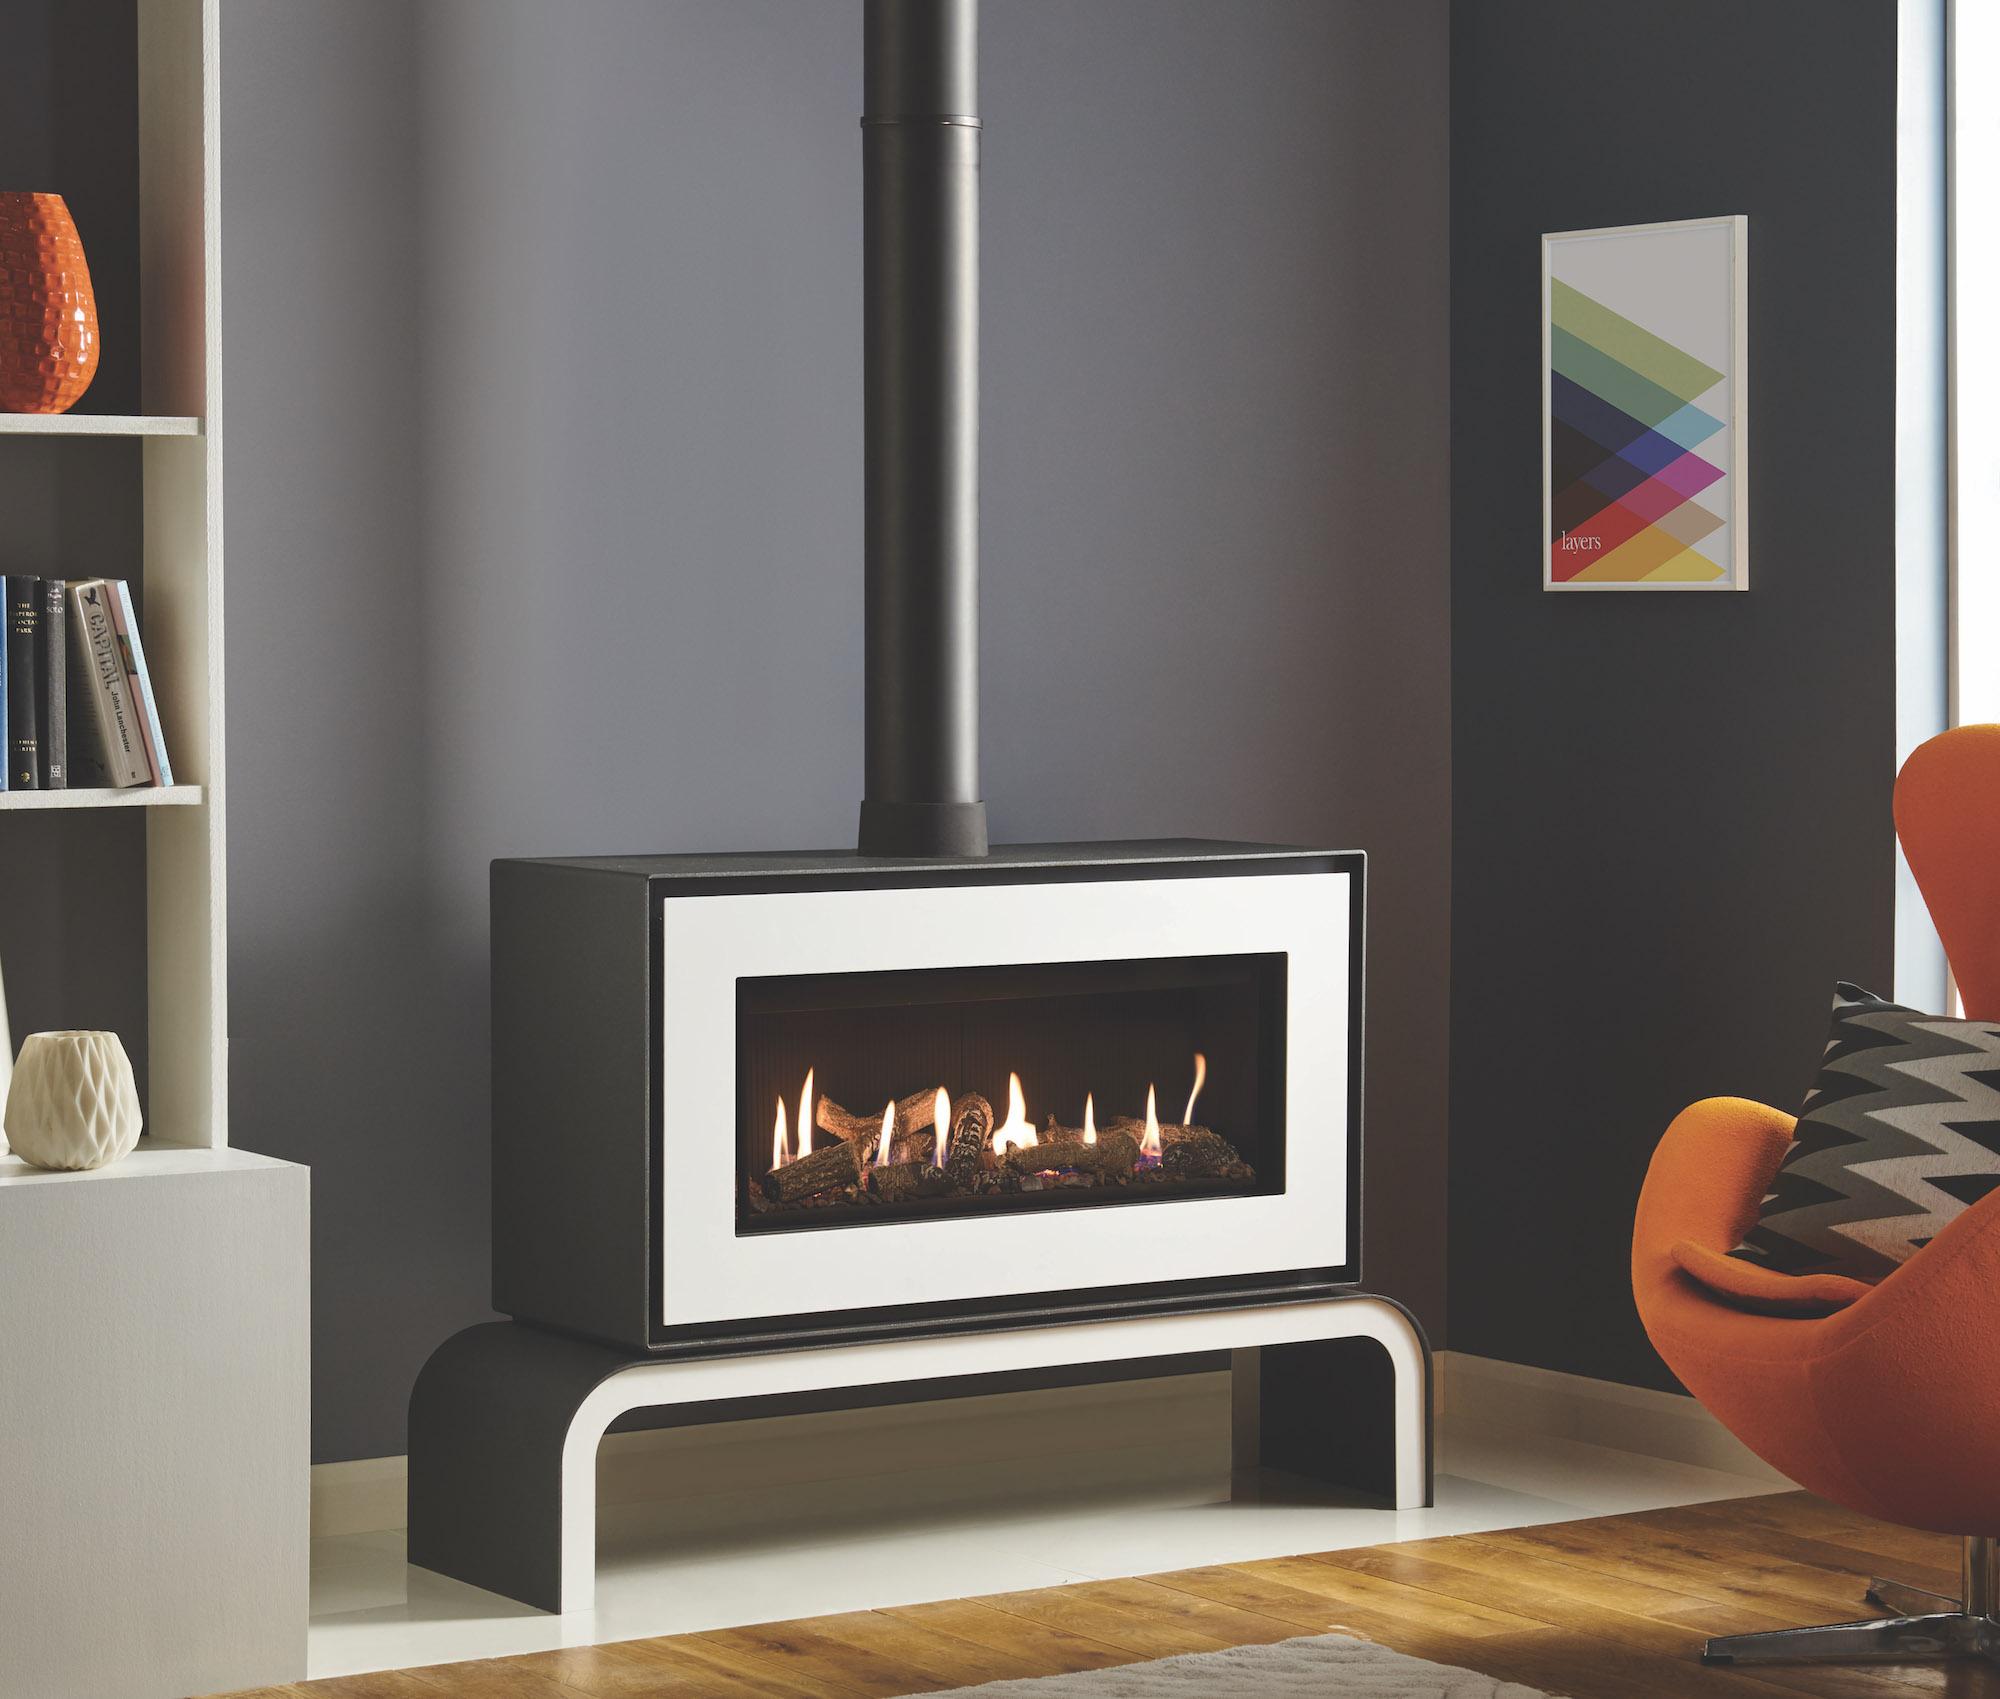 Gazco Studio 2 Freestanding Conventional Flue Gas Stove The Fireplace Company